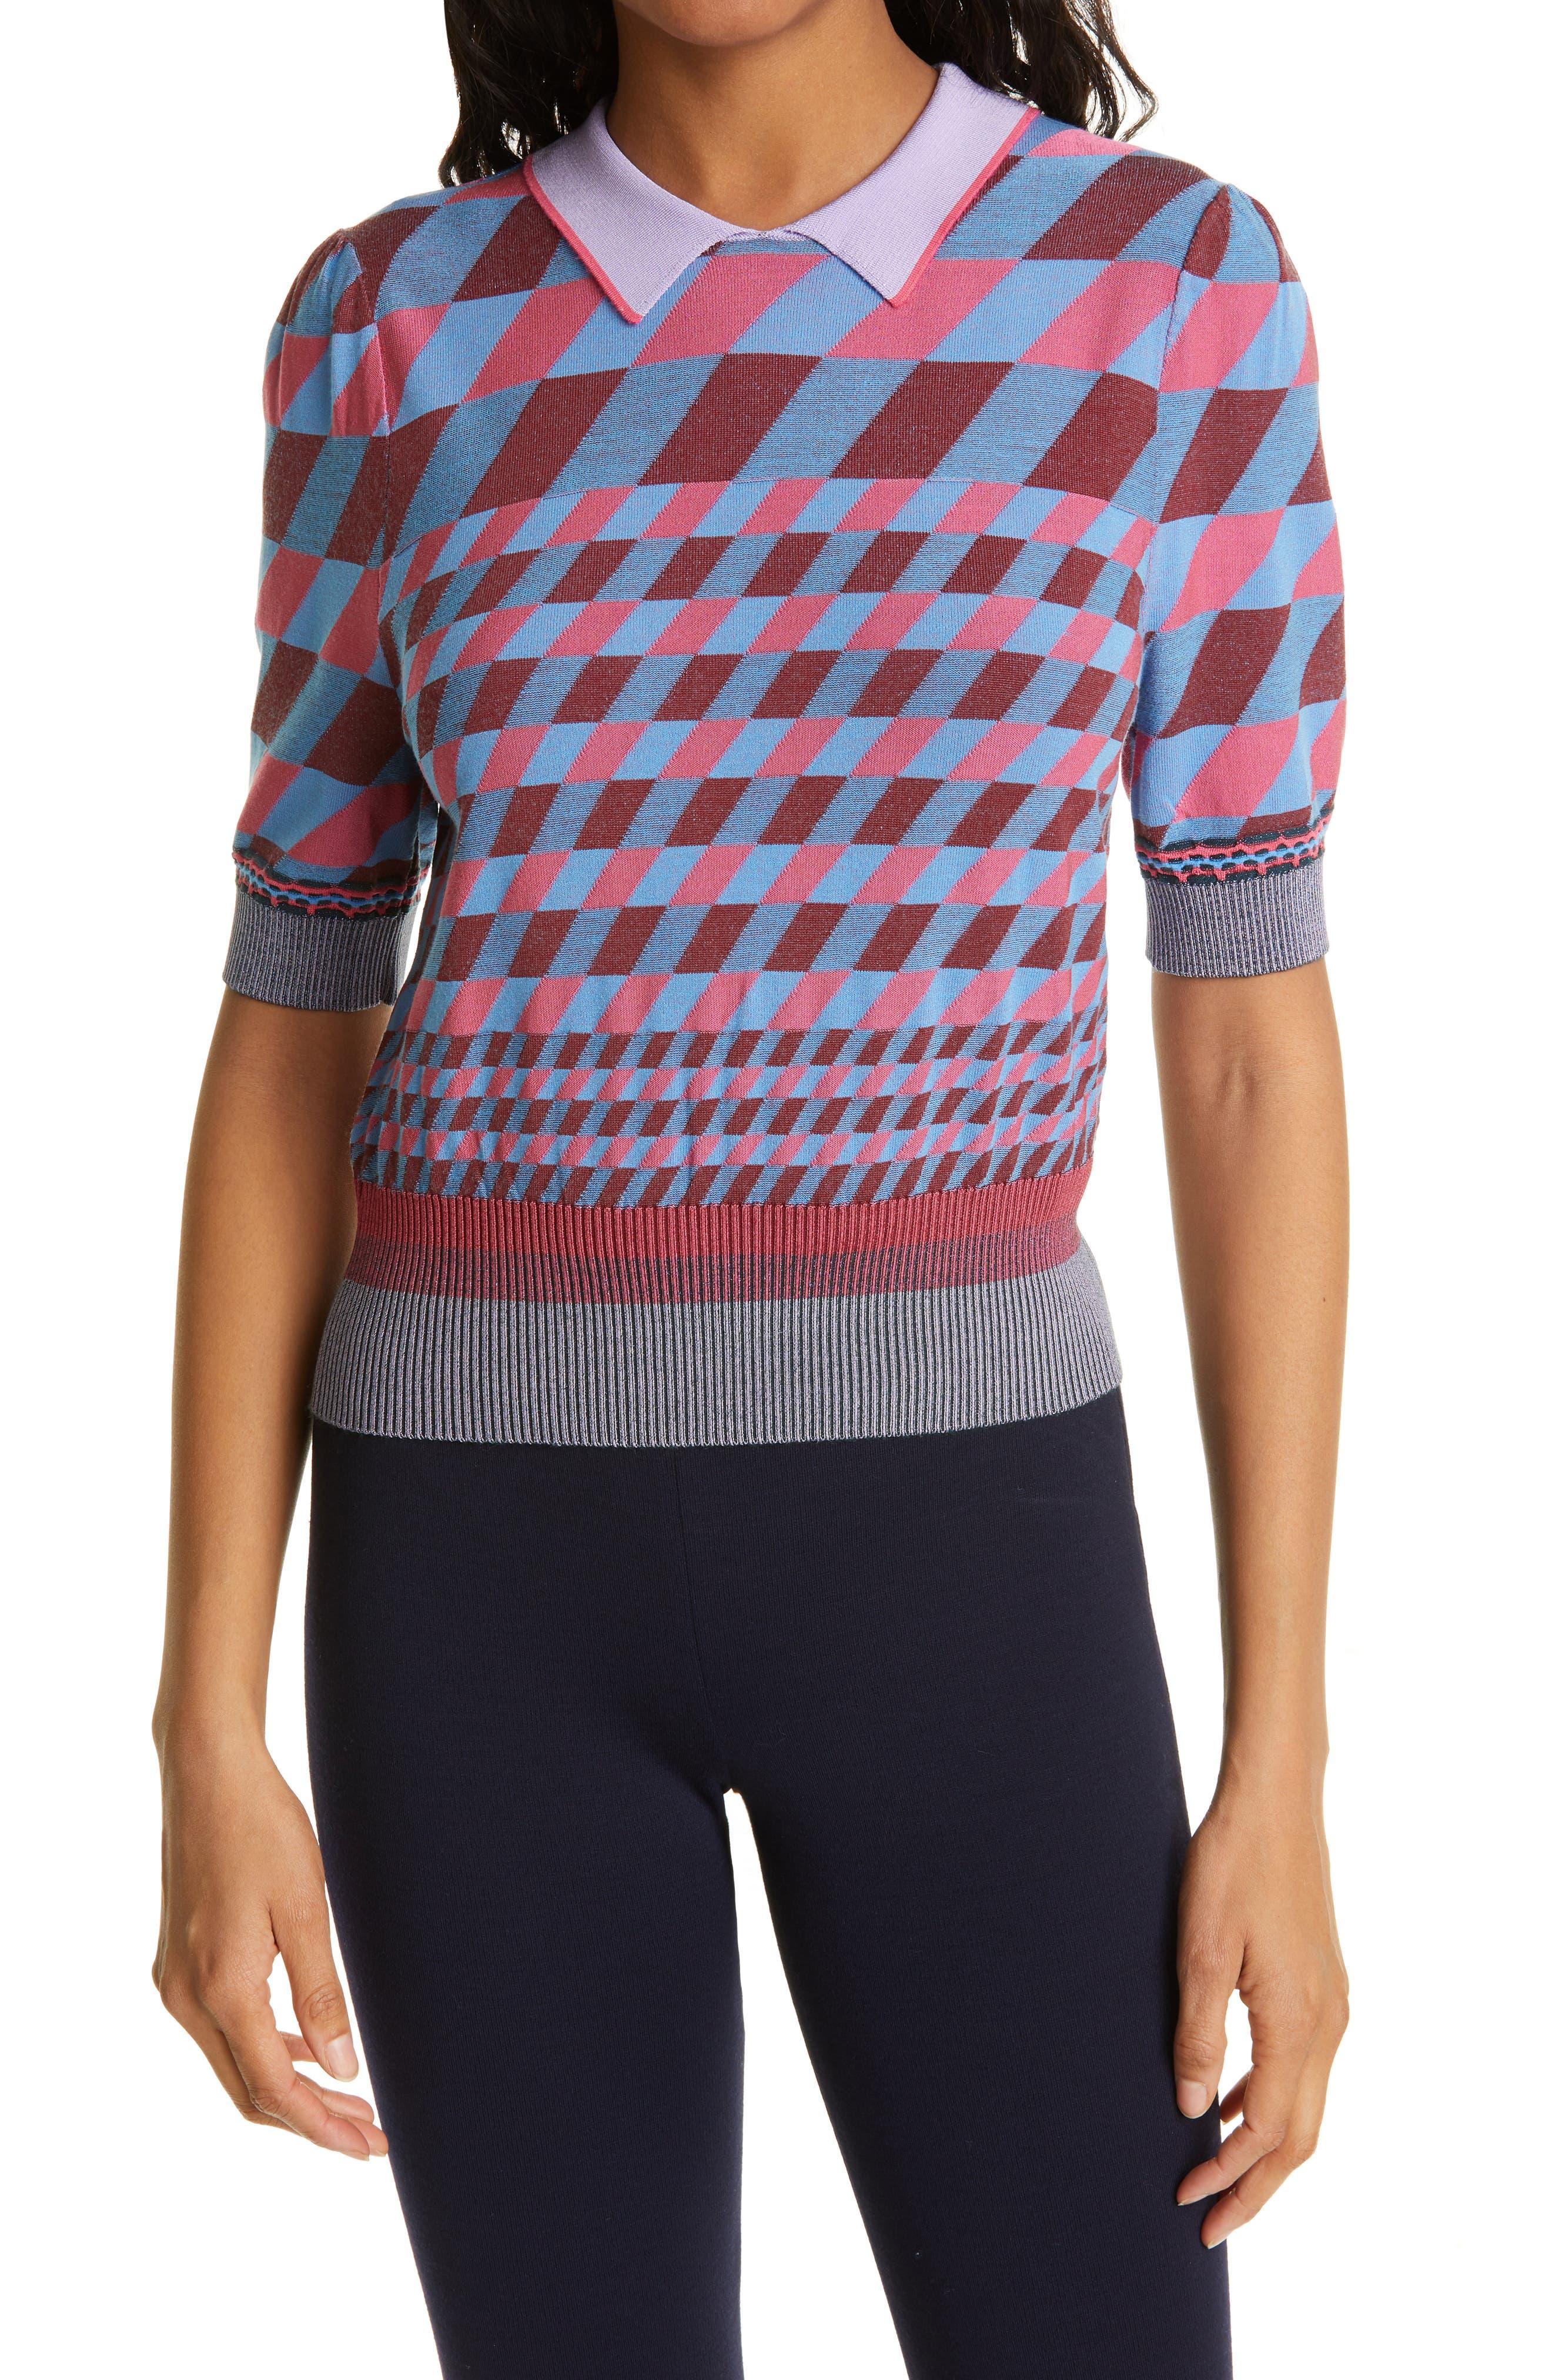 Jenny Collared Sweater